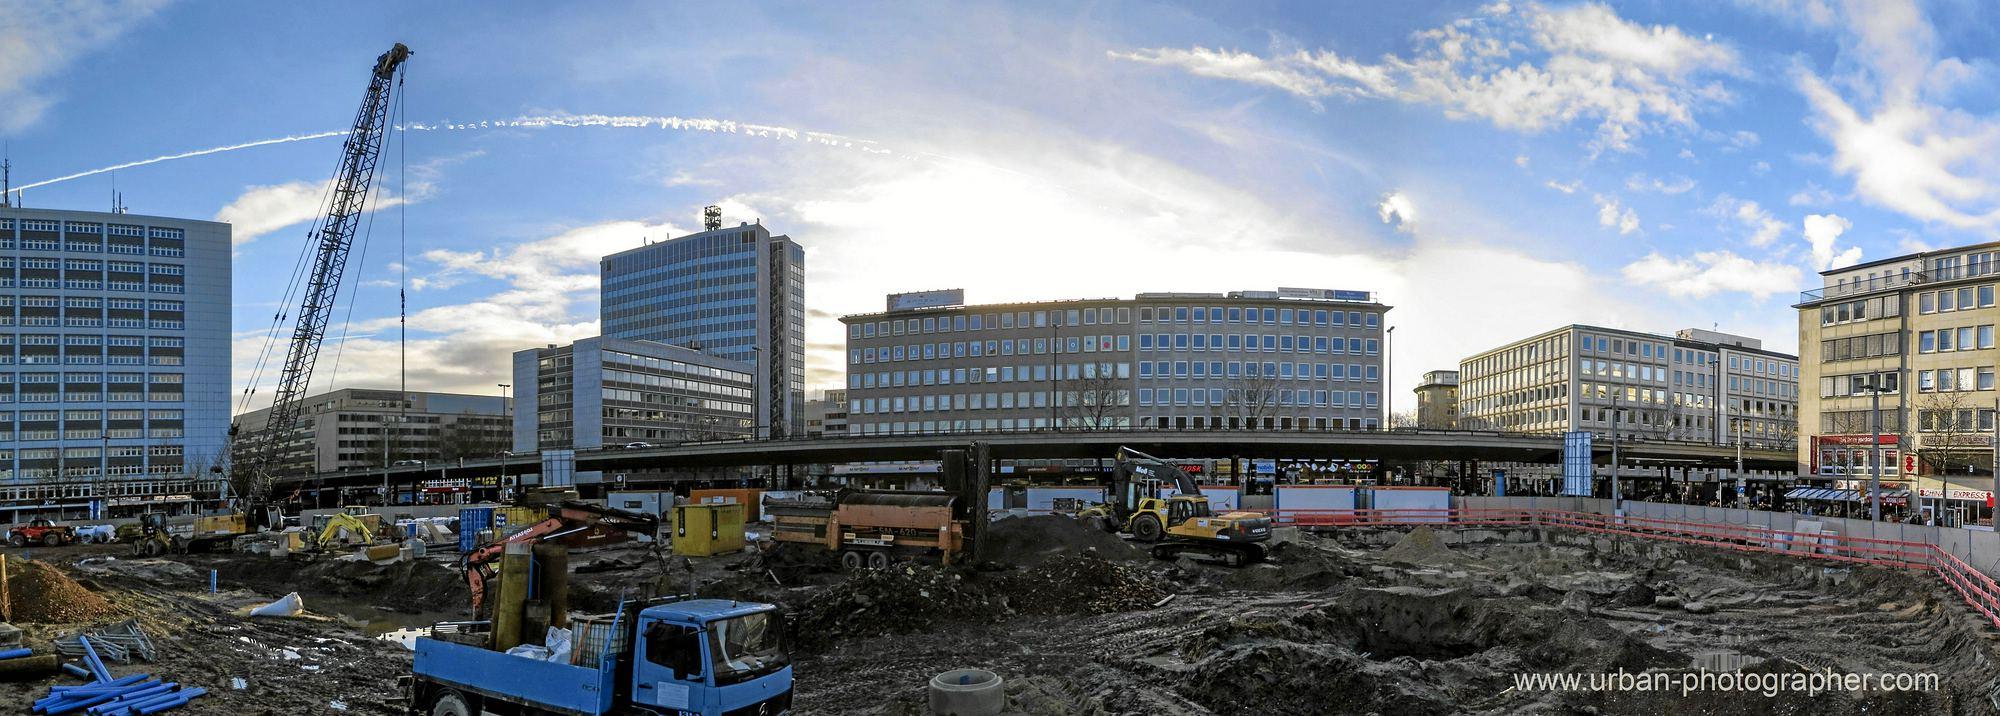 Baustelle Bahnhofsplatz 15